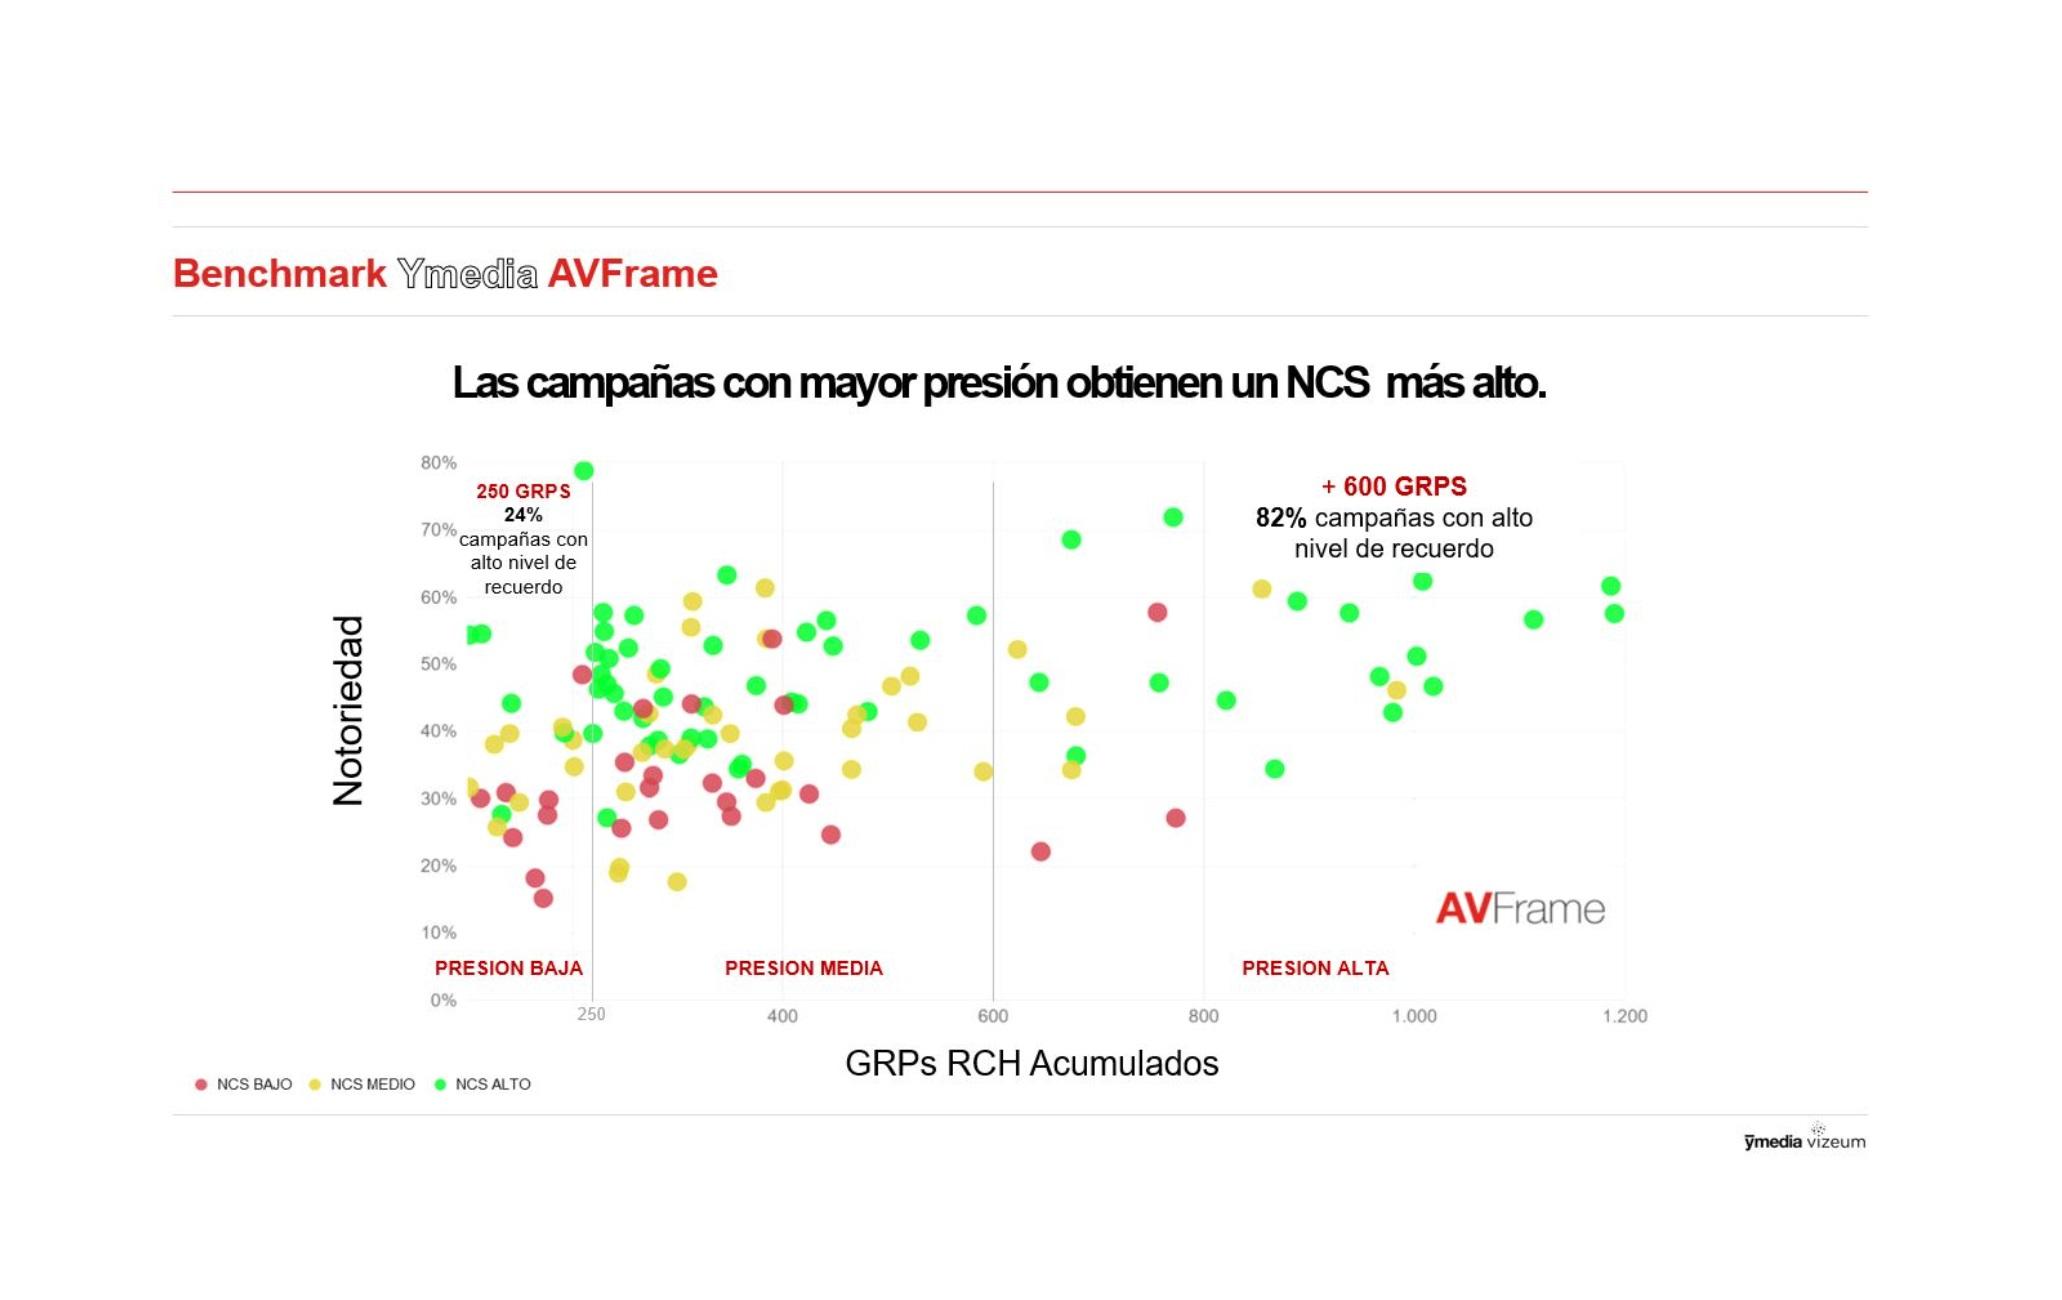 https://www.programapublicidad.com/wp-content/uploads/2020/10/campañas-notoriedad-benchmark-ymedia-GRPs-AVFrame-programapublicidad.jpg